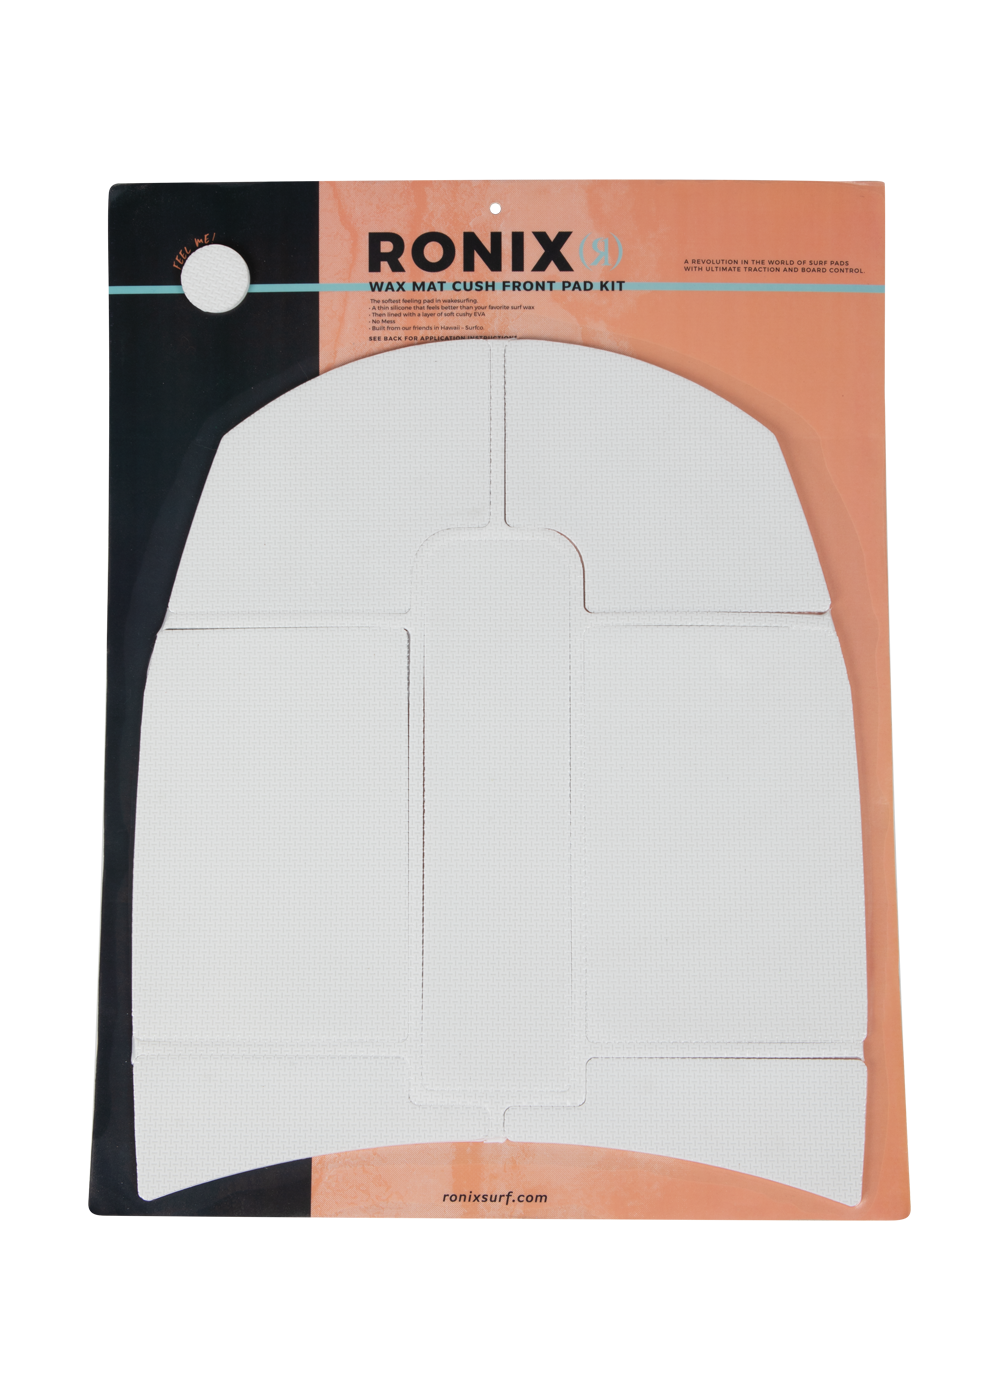 Ronix Wax Mat Cush Front Pad Kit